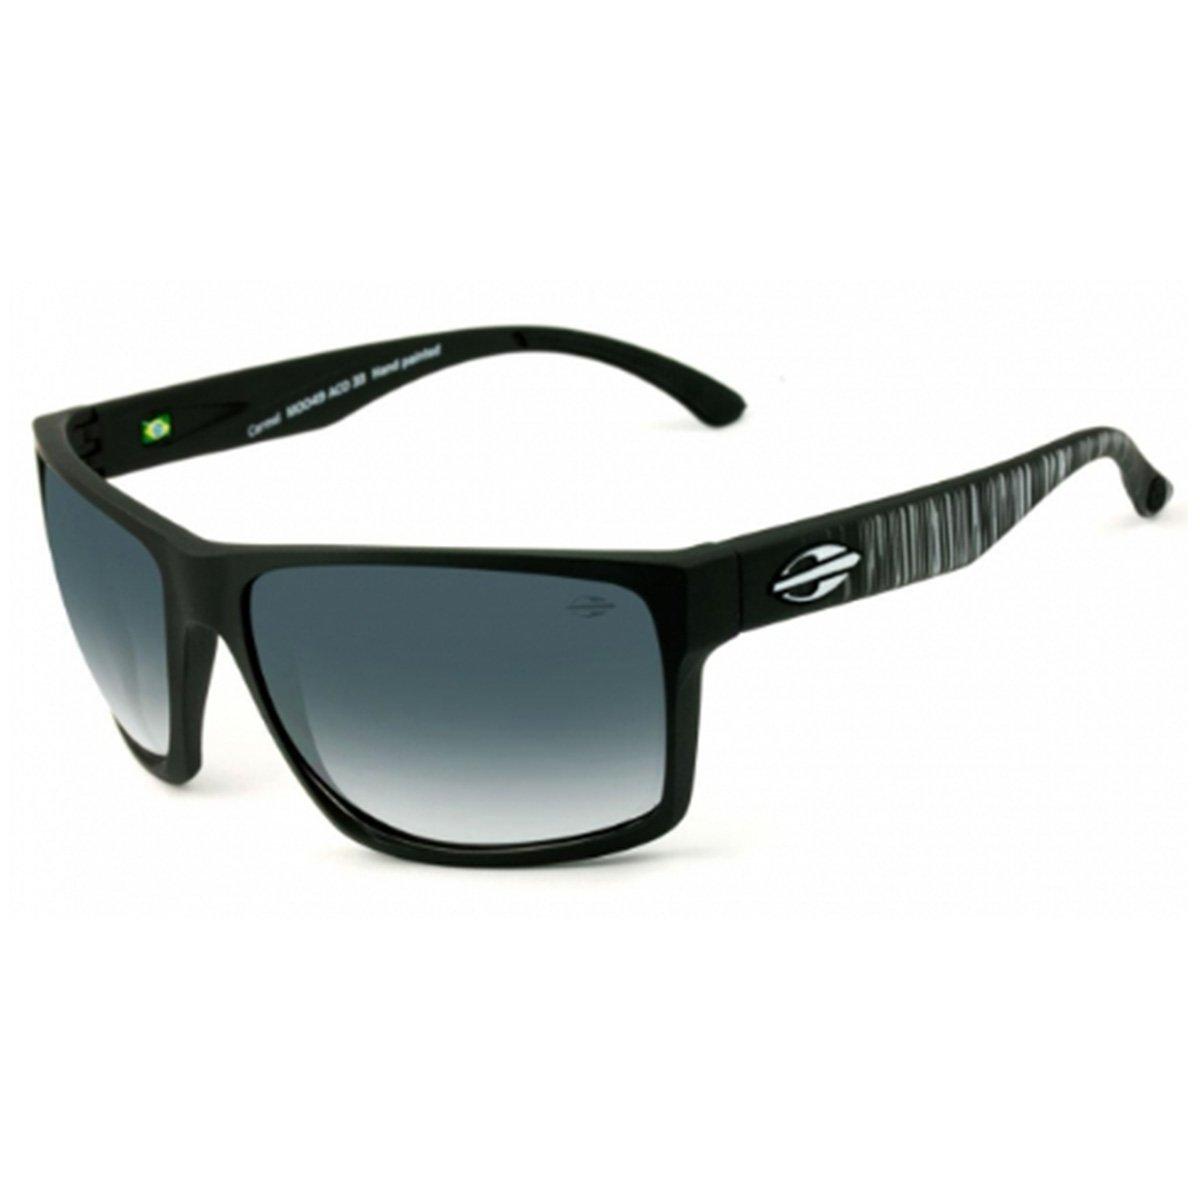 2103aecd331f4 Compre Óculos de Sol Mormaii Carmel em 10X